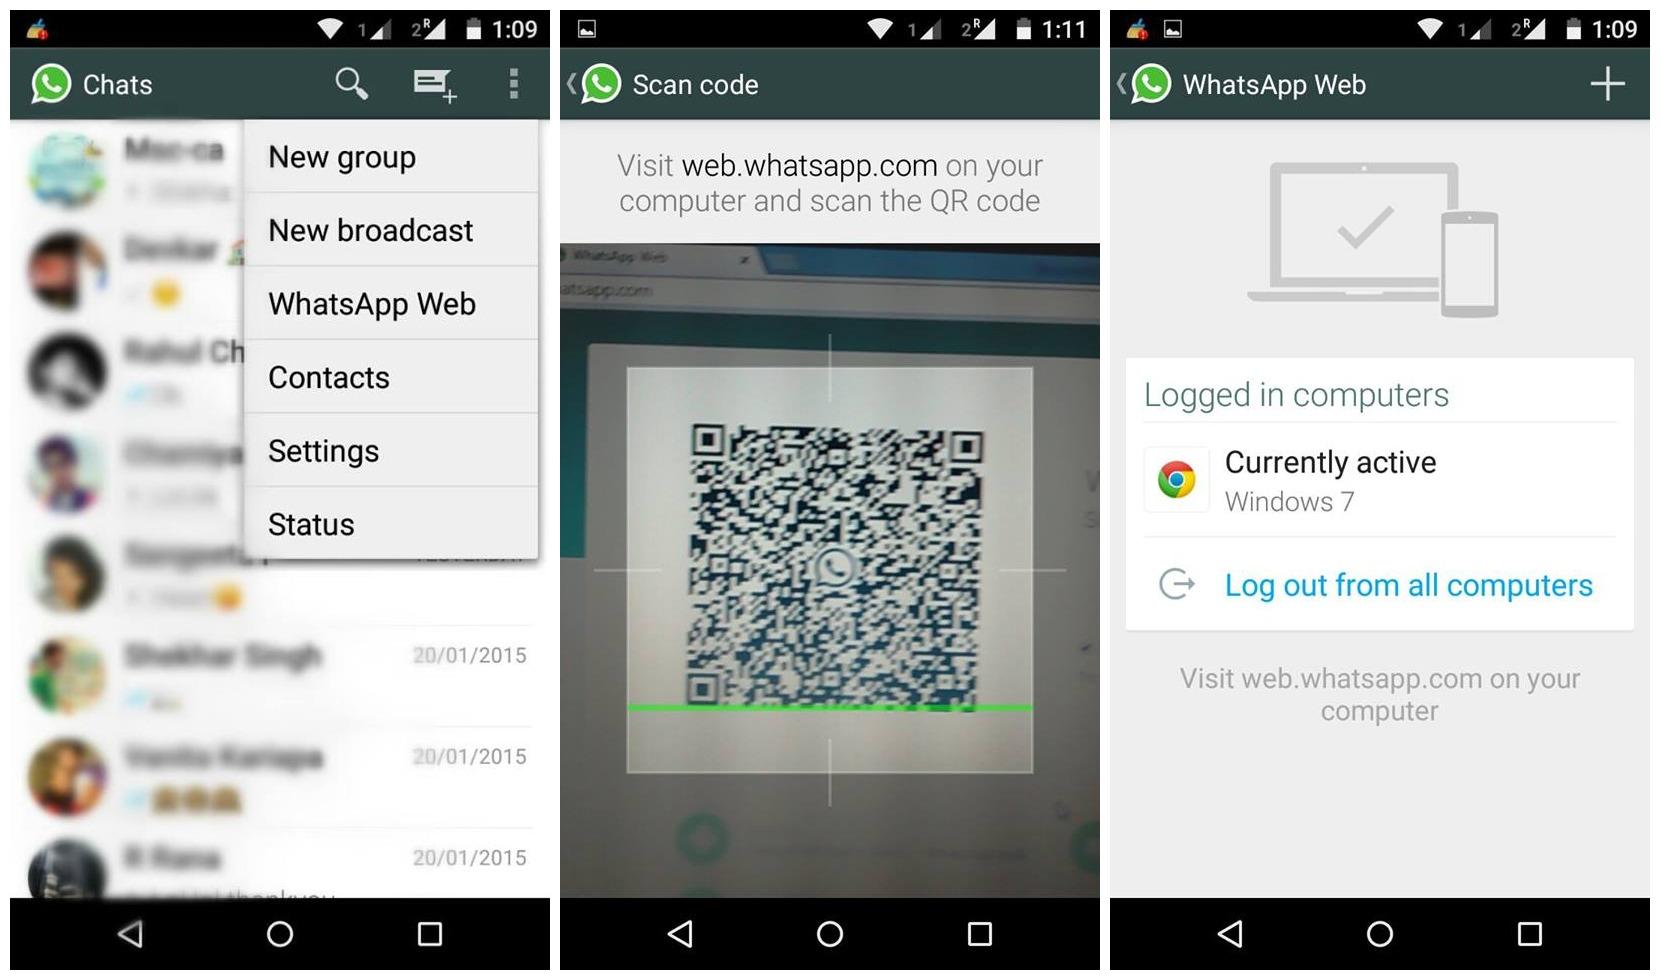 WhatsApp Web codice QR